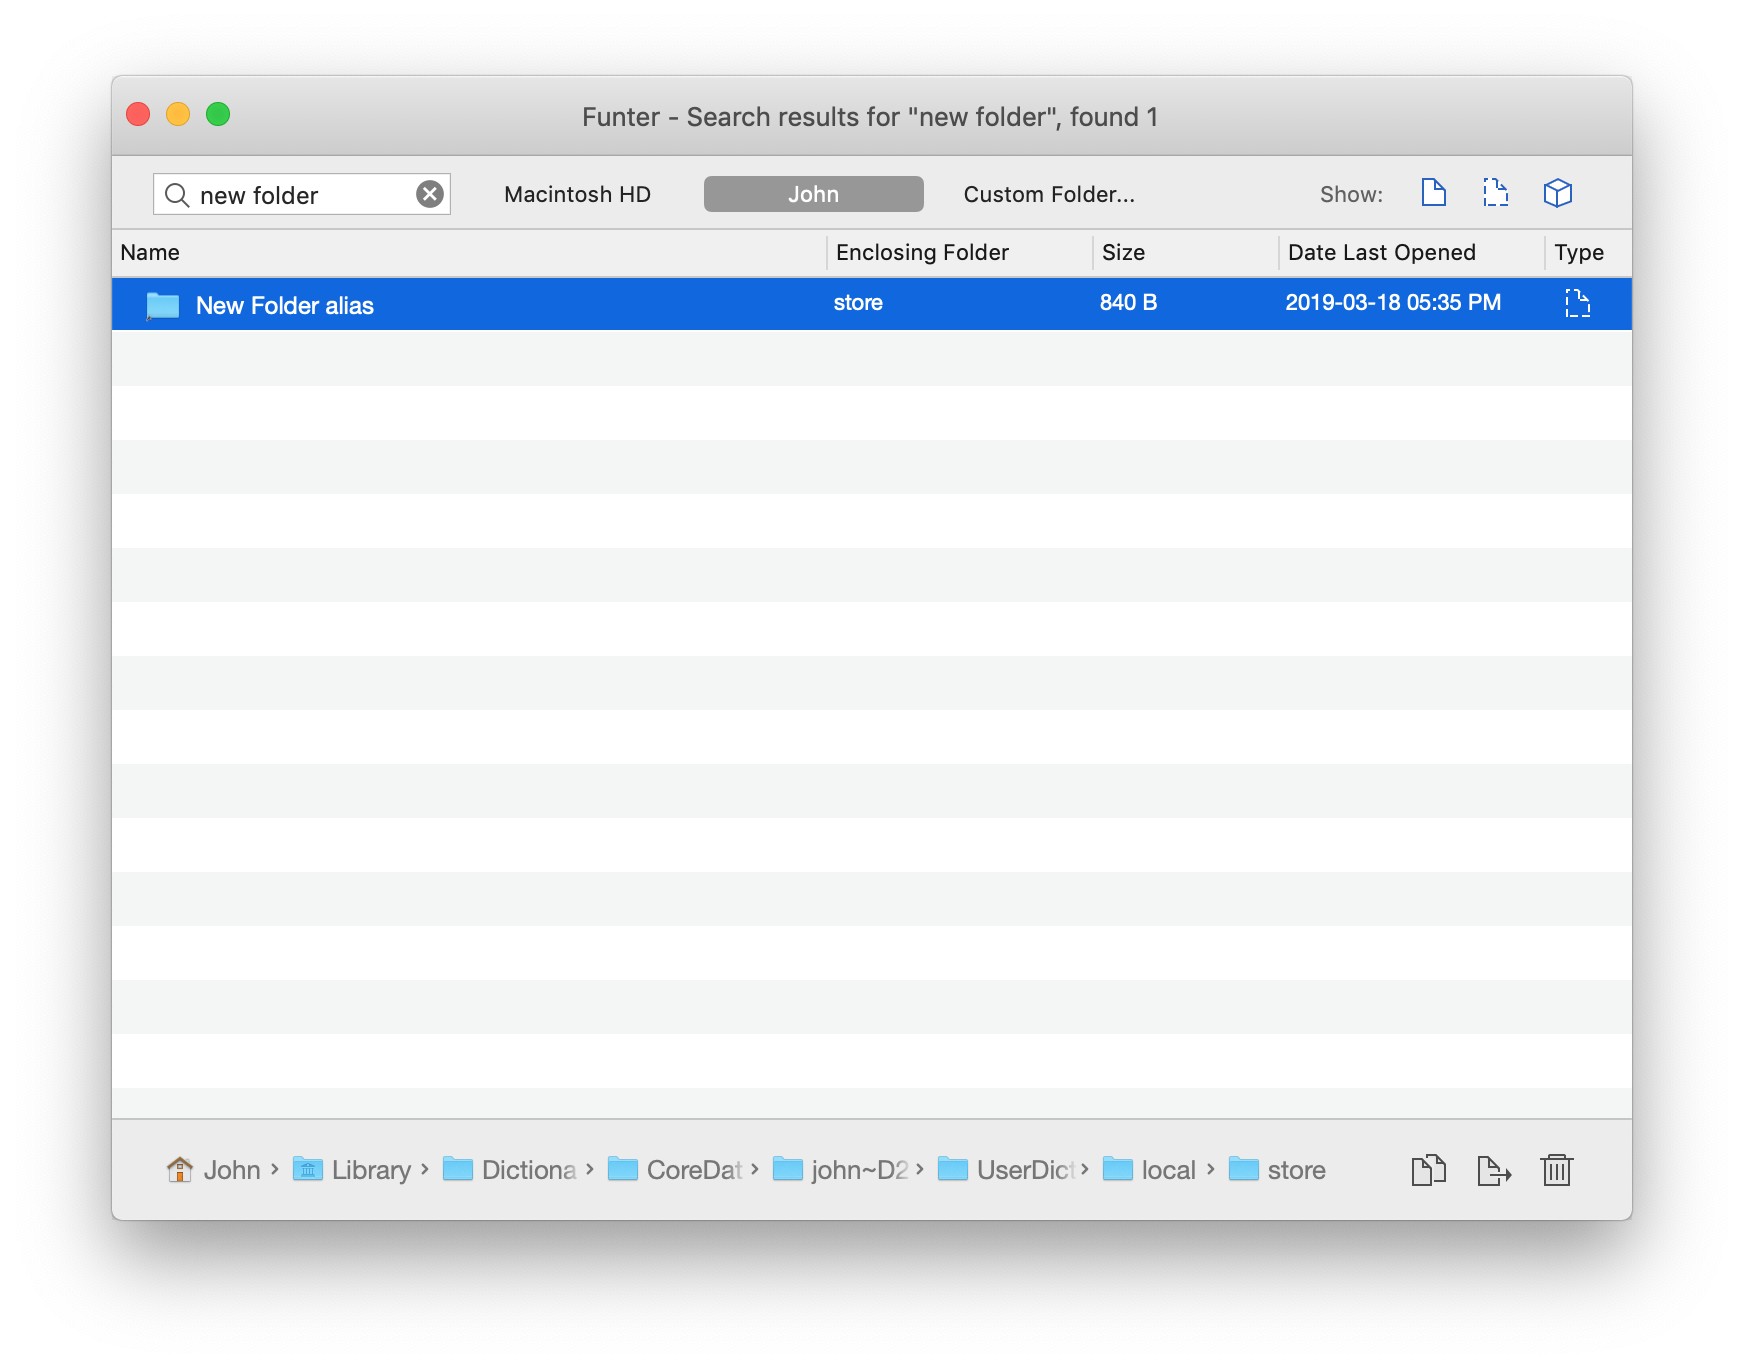 New folder alias files in Funter